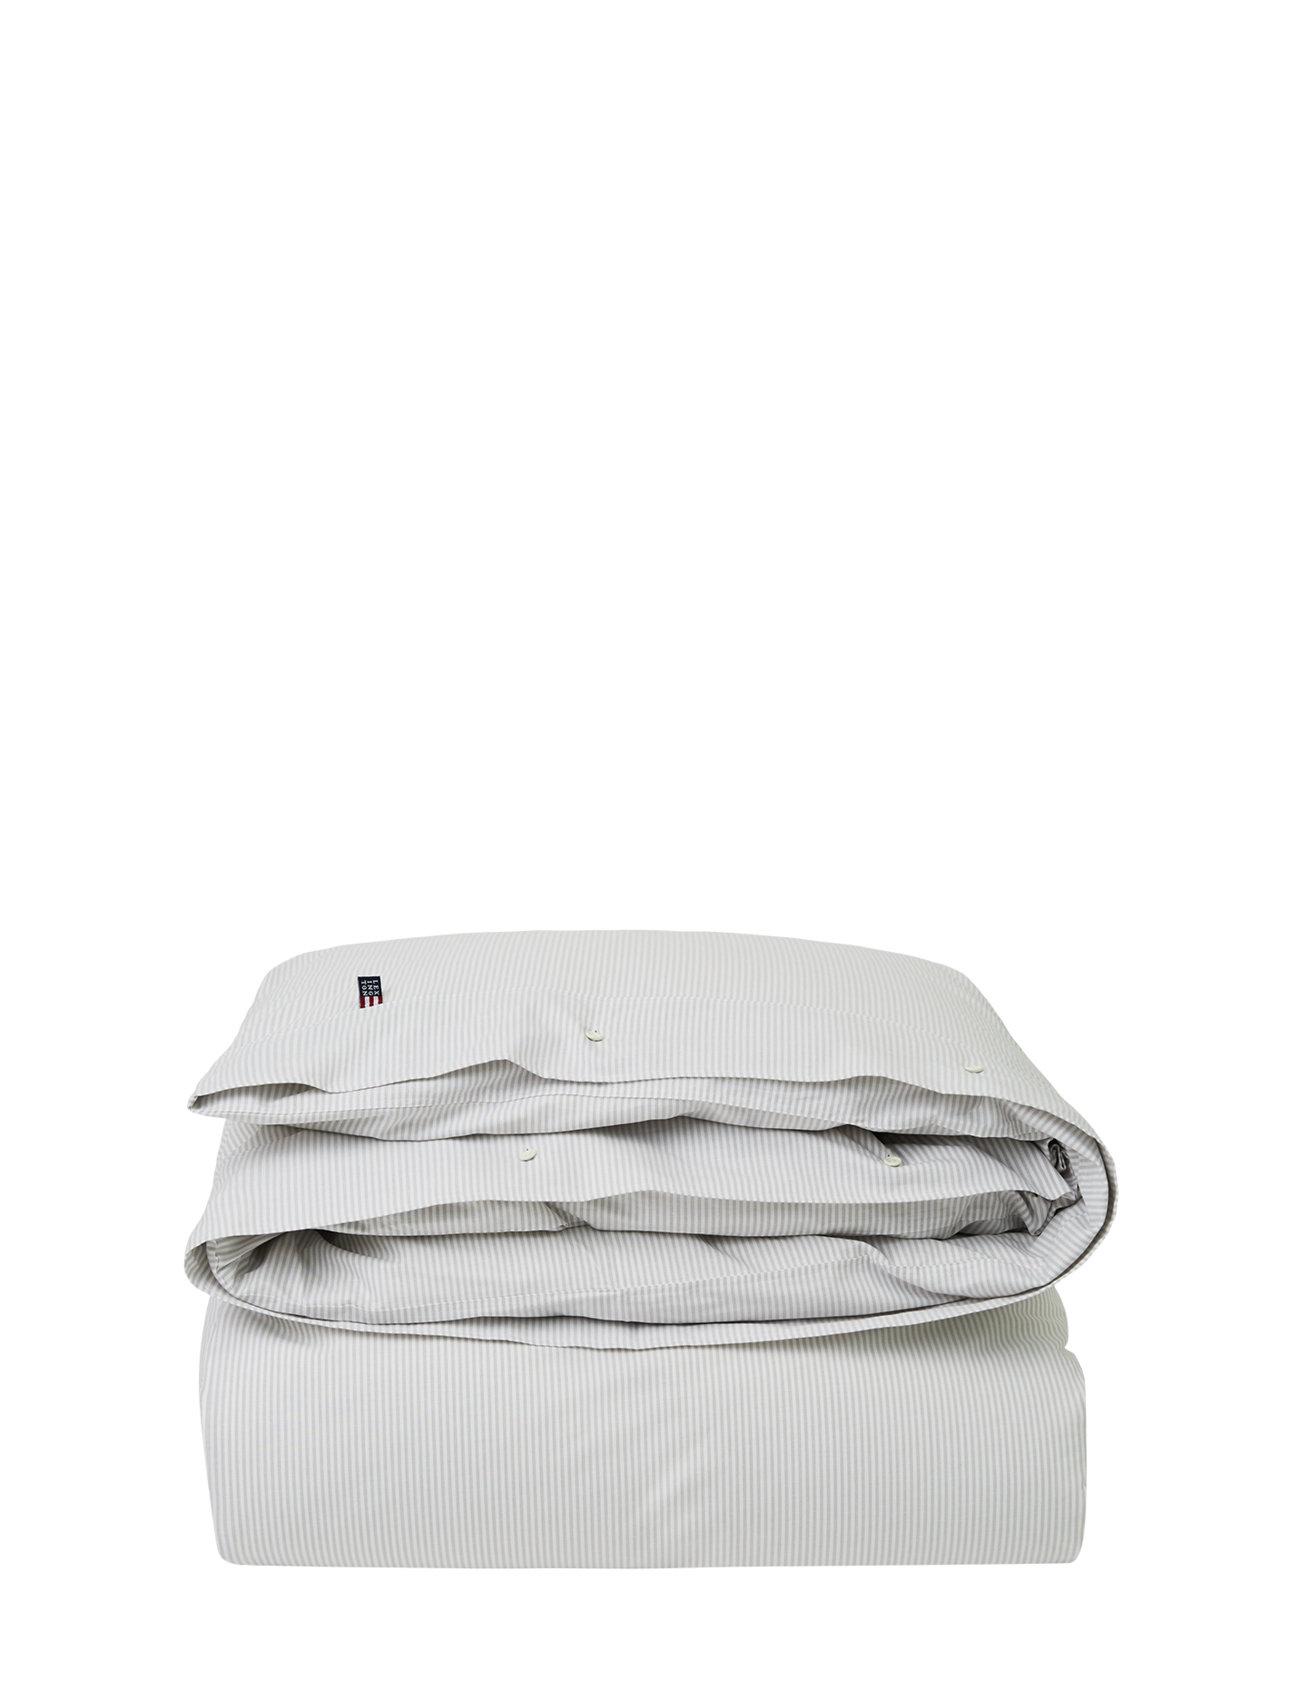 Lexington Home Pin Point Beige/White Duvet - BEIGE/WHITE